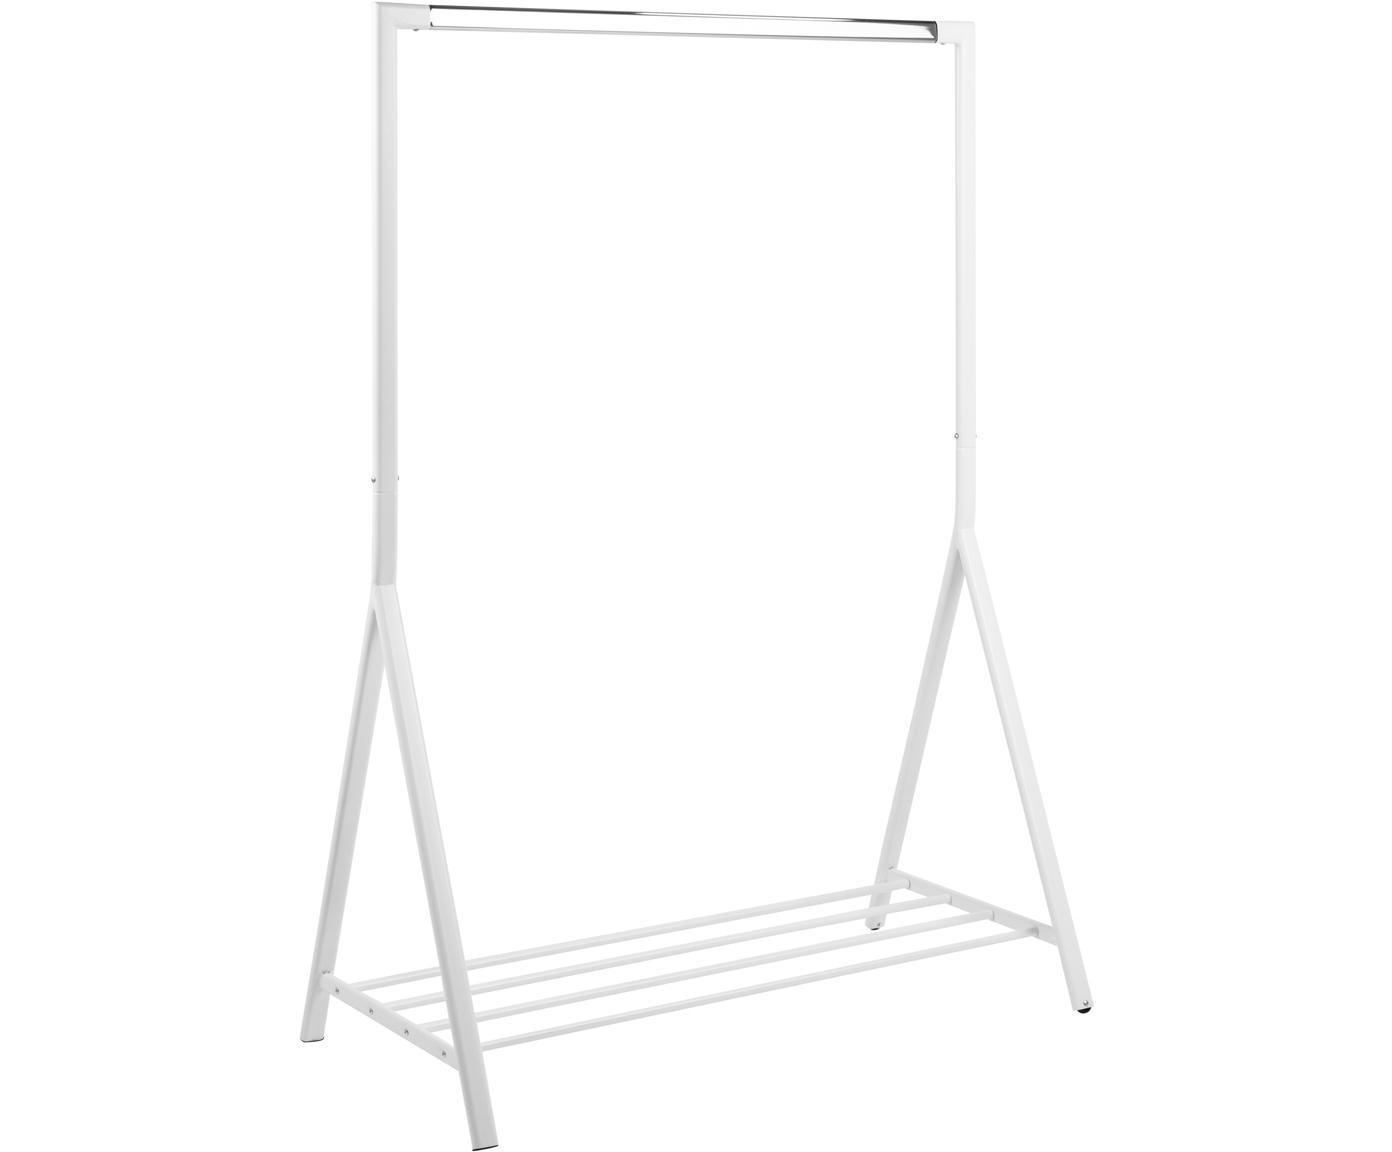 Perchero de metal Brent, Metal con pintura en polvo, Blanco, An 117 x F 59 cm